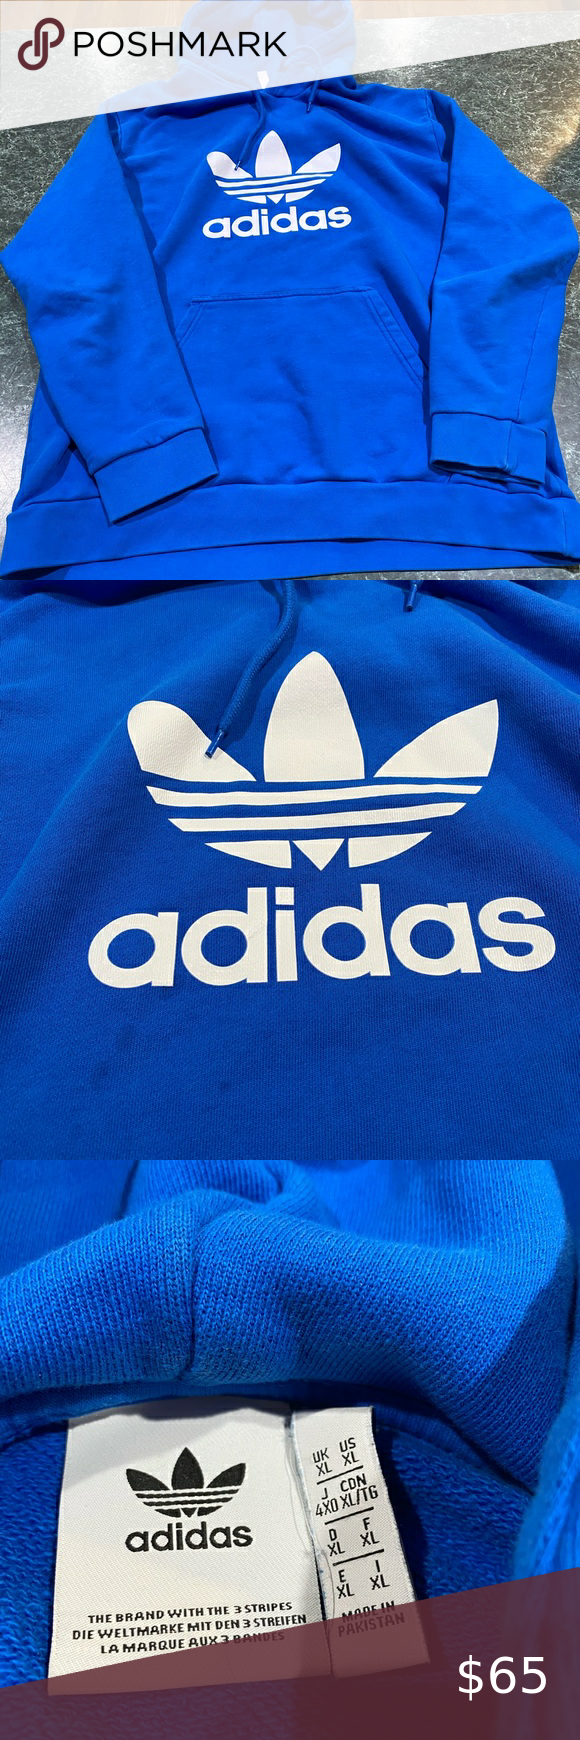 Adidas Blue Big Trefoil Logo Hoodie Men S Sz Large Hoodies Men Blue Adidas Sweatshirt Shirt [ 1740 x 580 Pixel ]